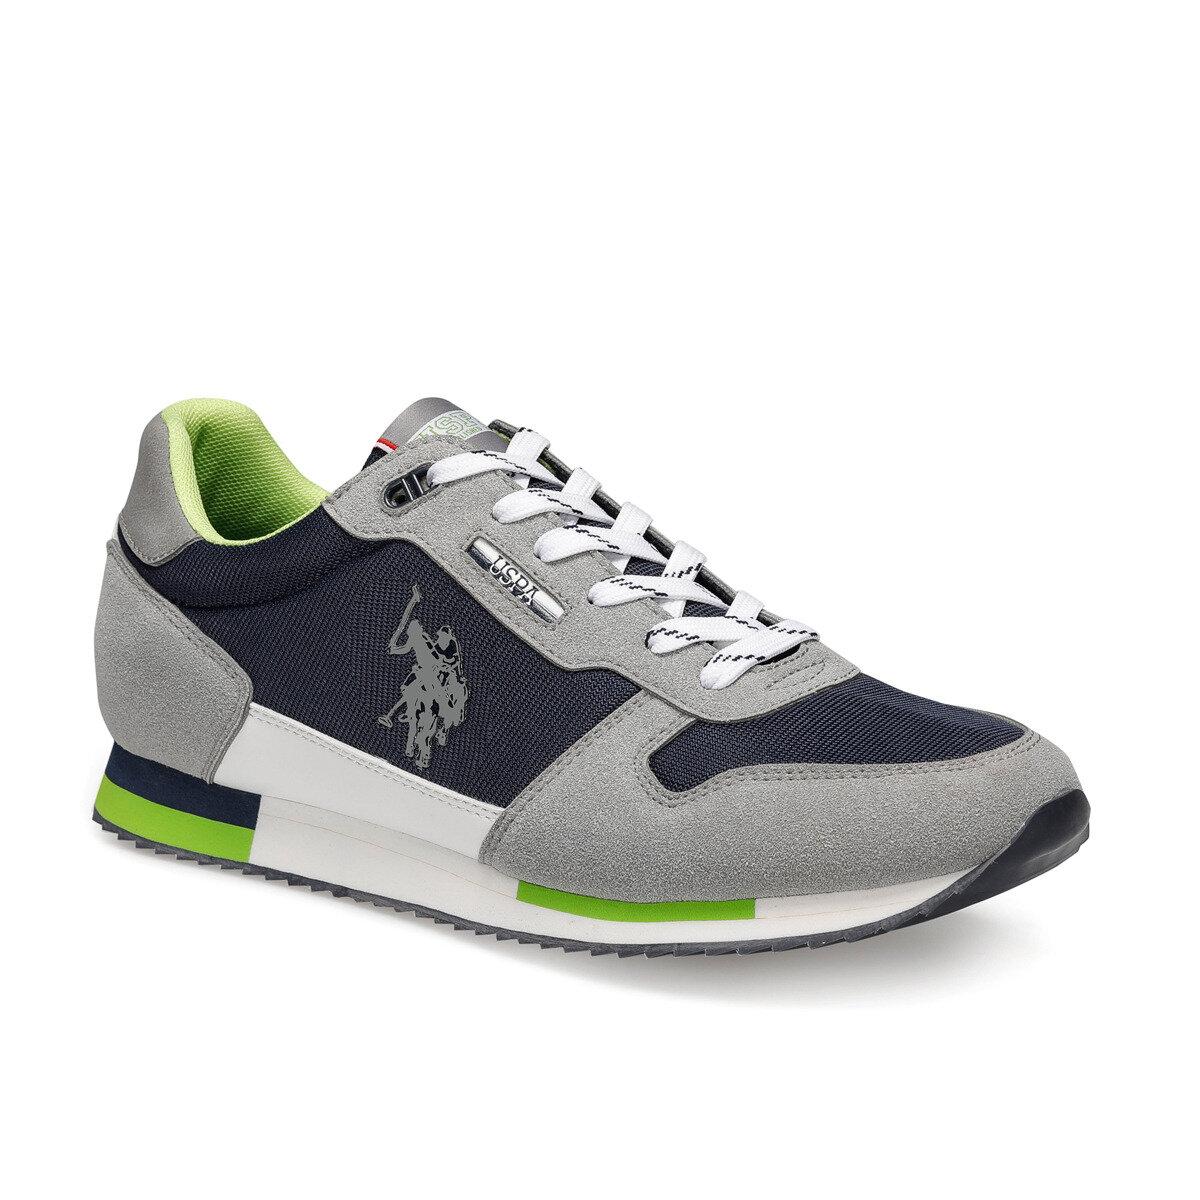 FLO POND Gray Men 'S Sports Shoes U.S. POLO ASSN.